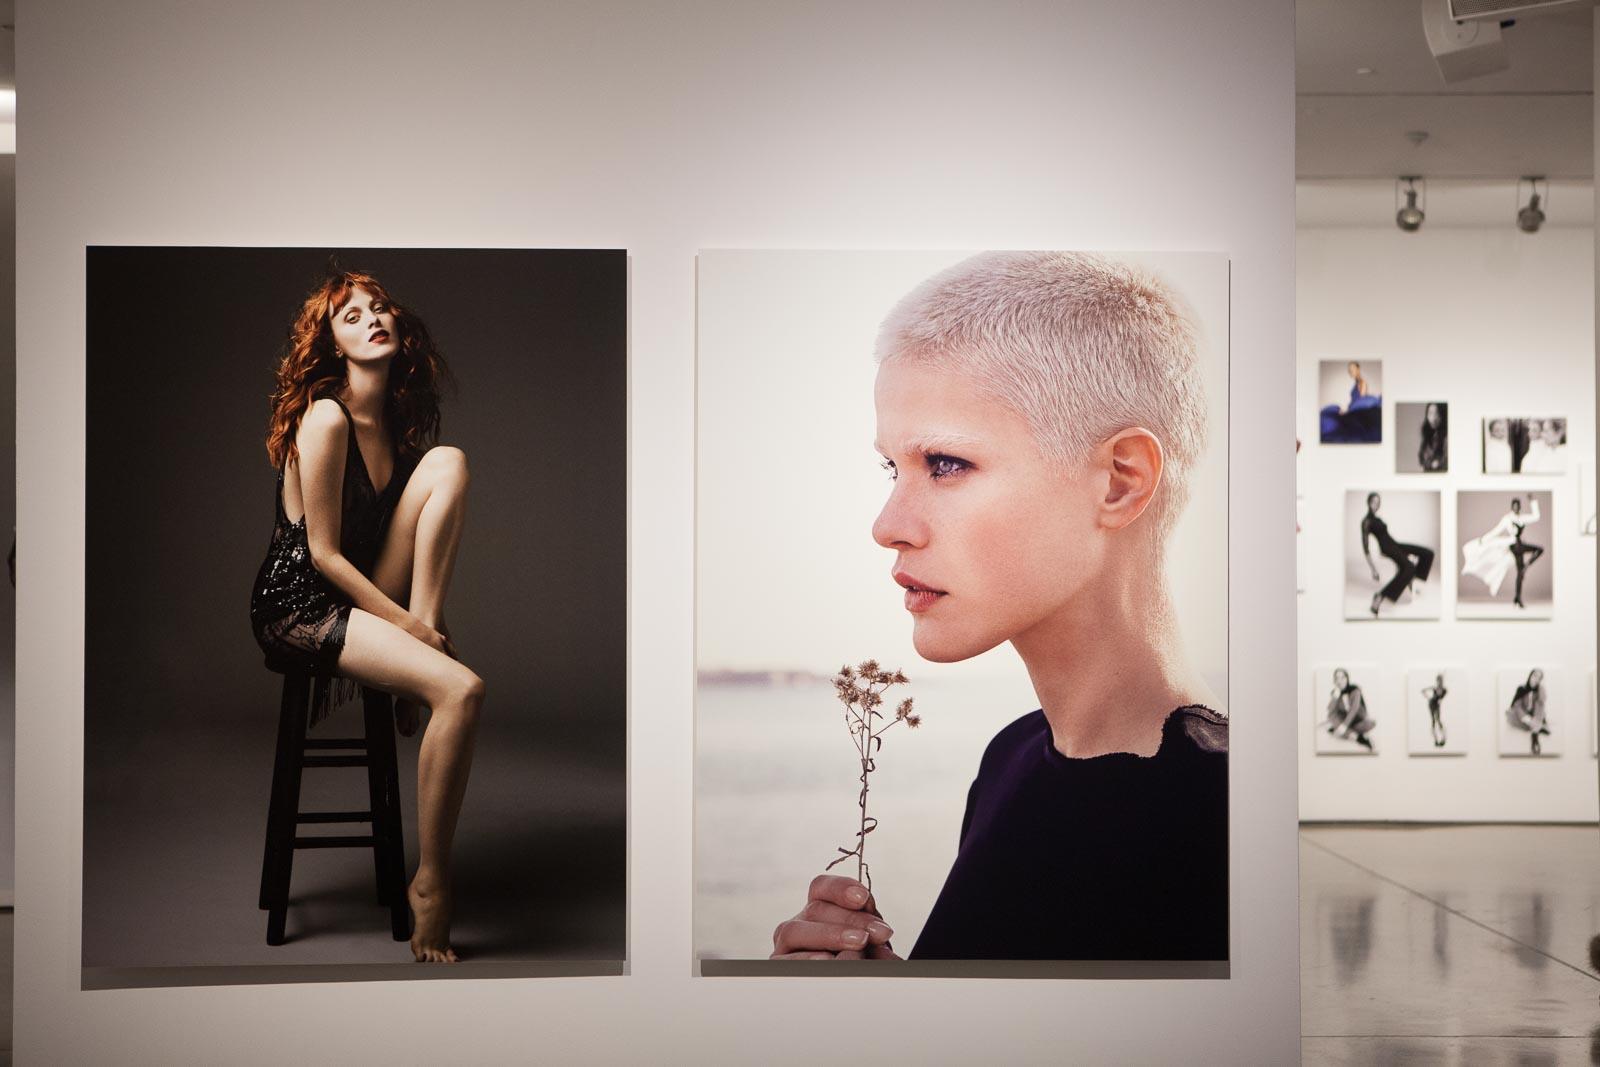 alexi-lubomirski-diverse-beauty-exhibition-robertiaga-13